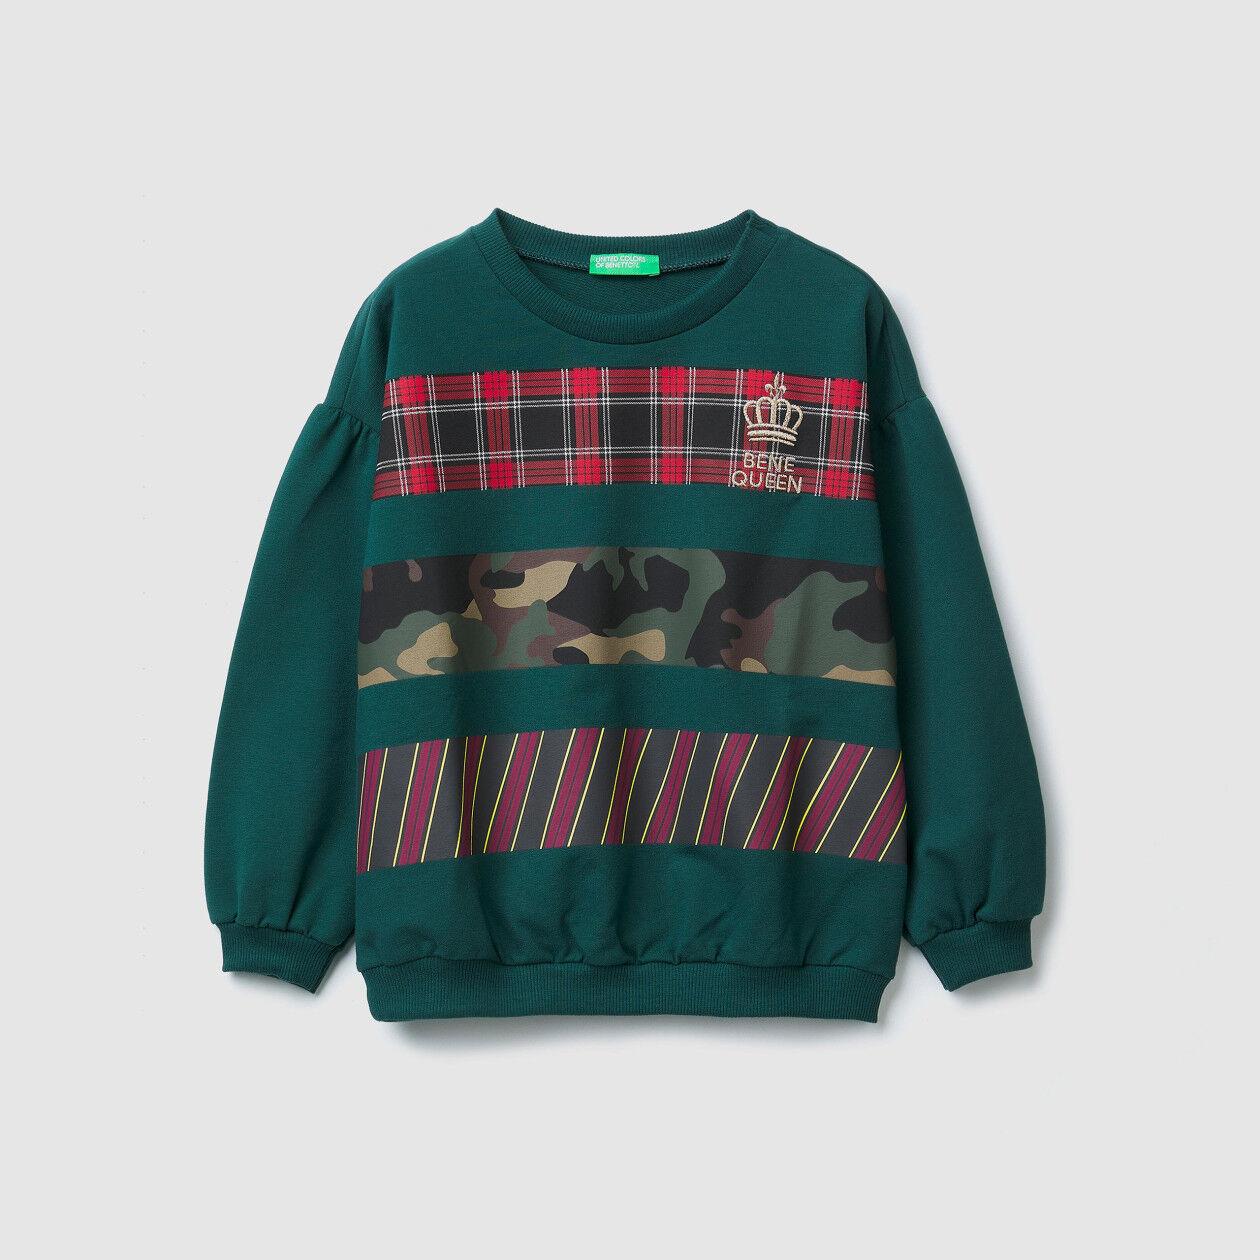 Sweatshirt with printed inserts